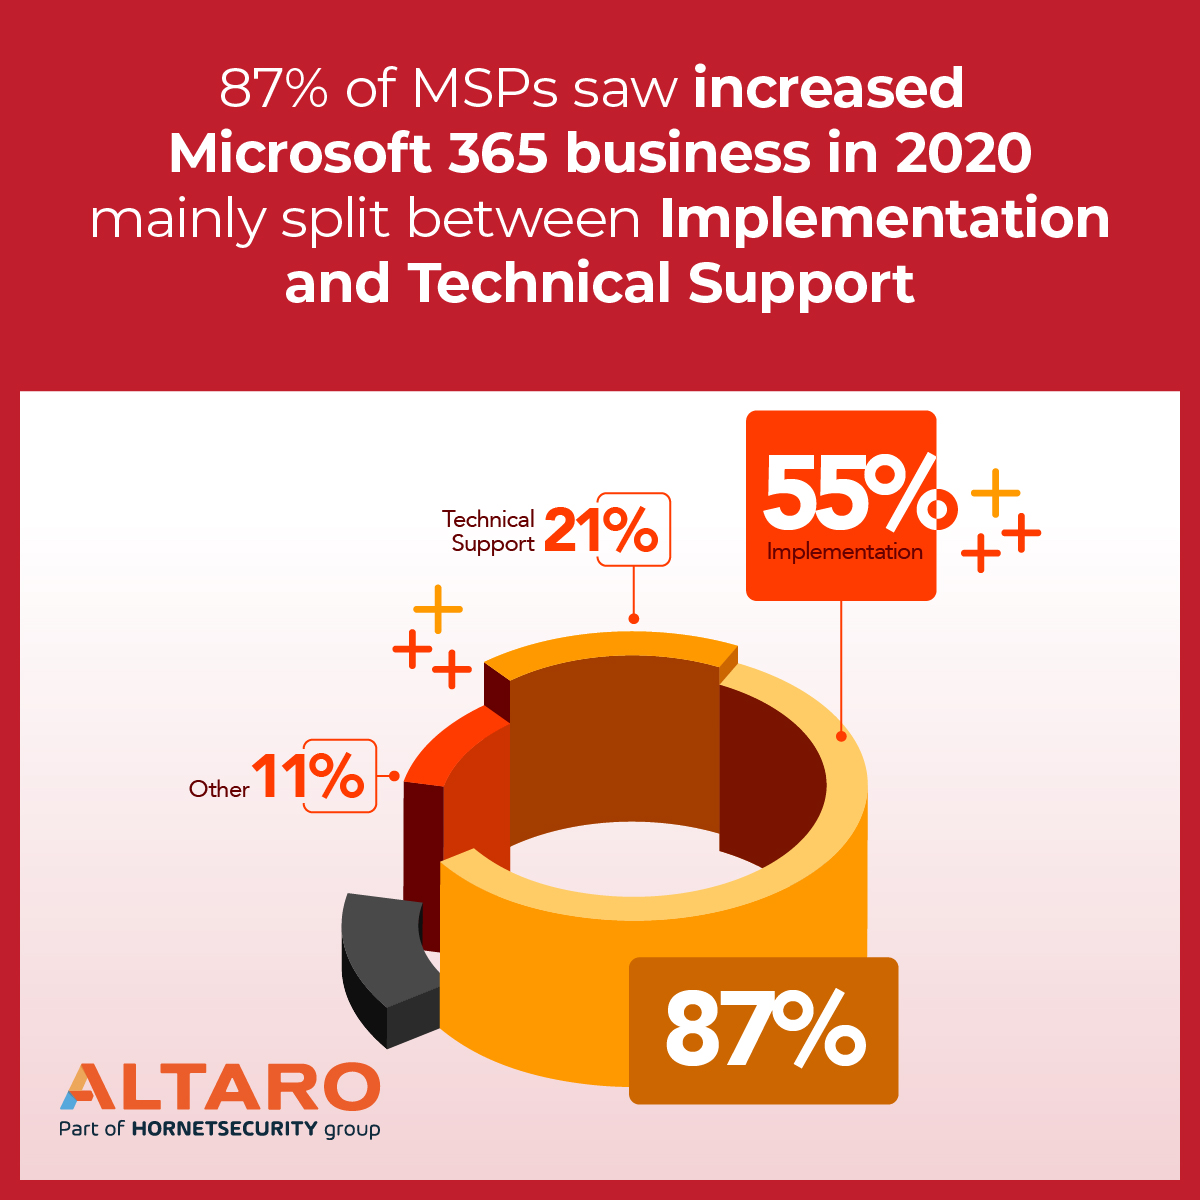 87% MSP increased microsoft 365 business